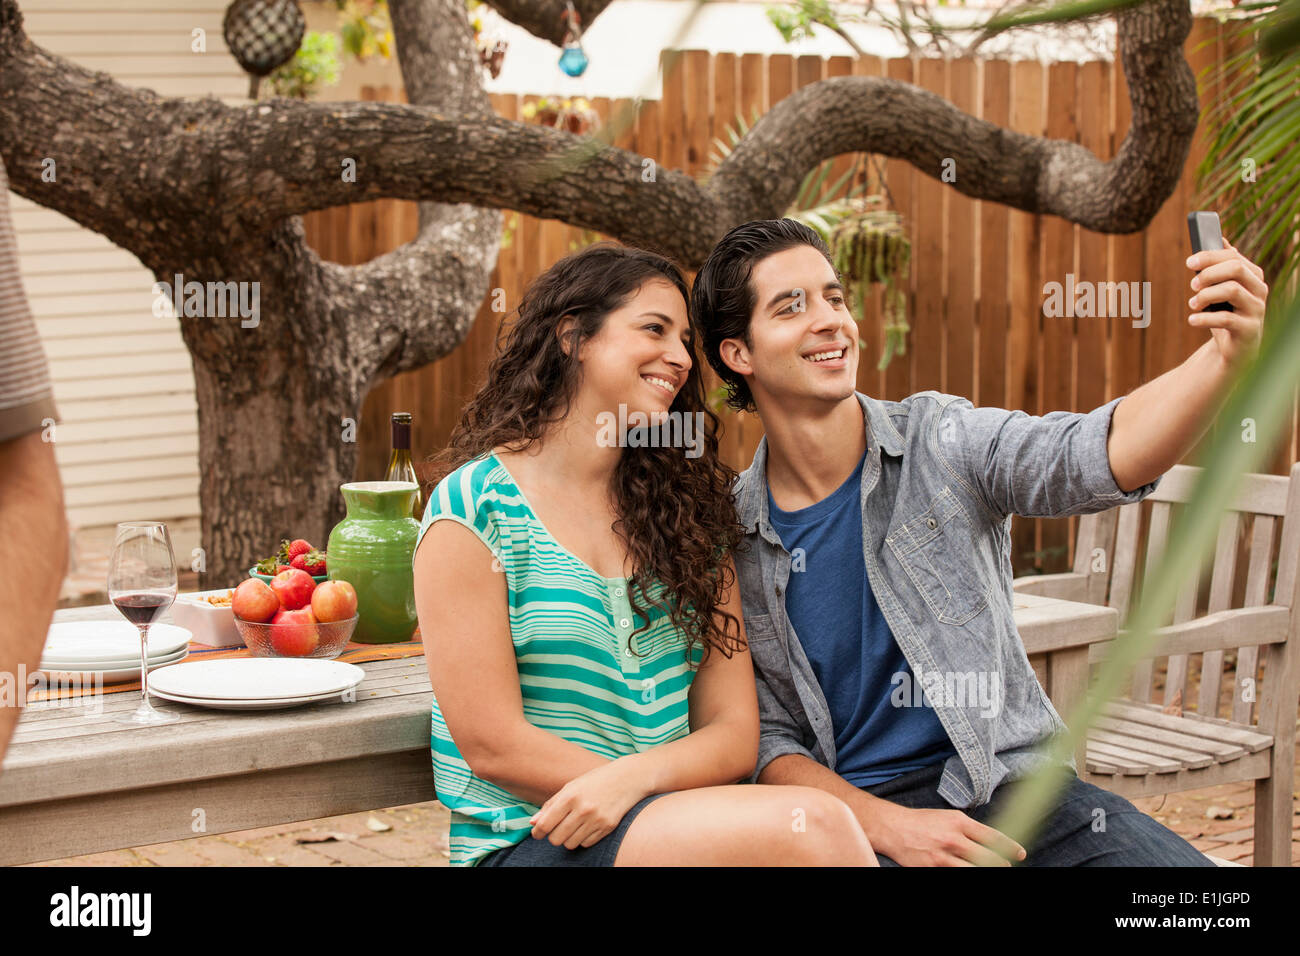 Couple taking self portrait photograph using smartphone - Stock Image